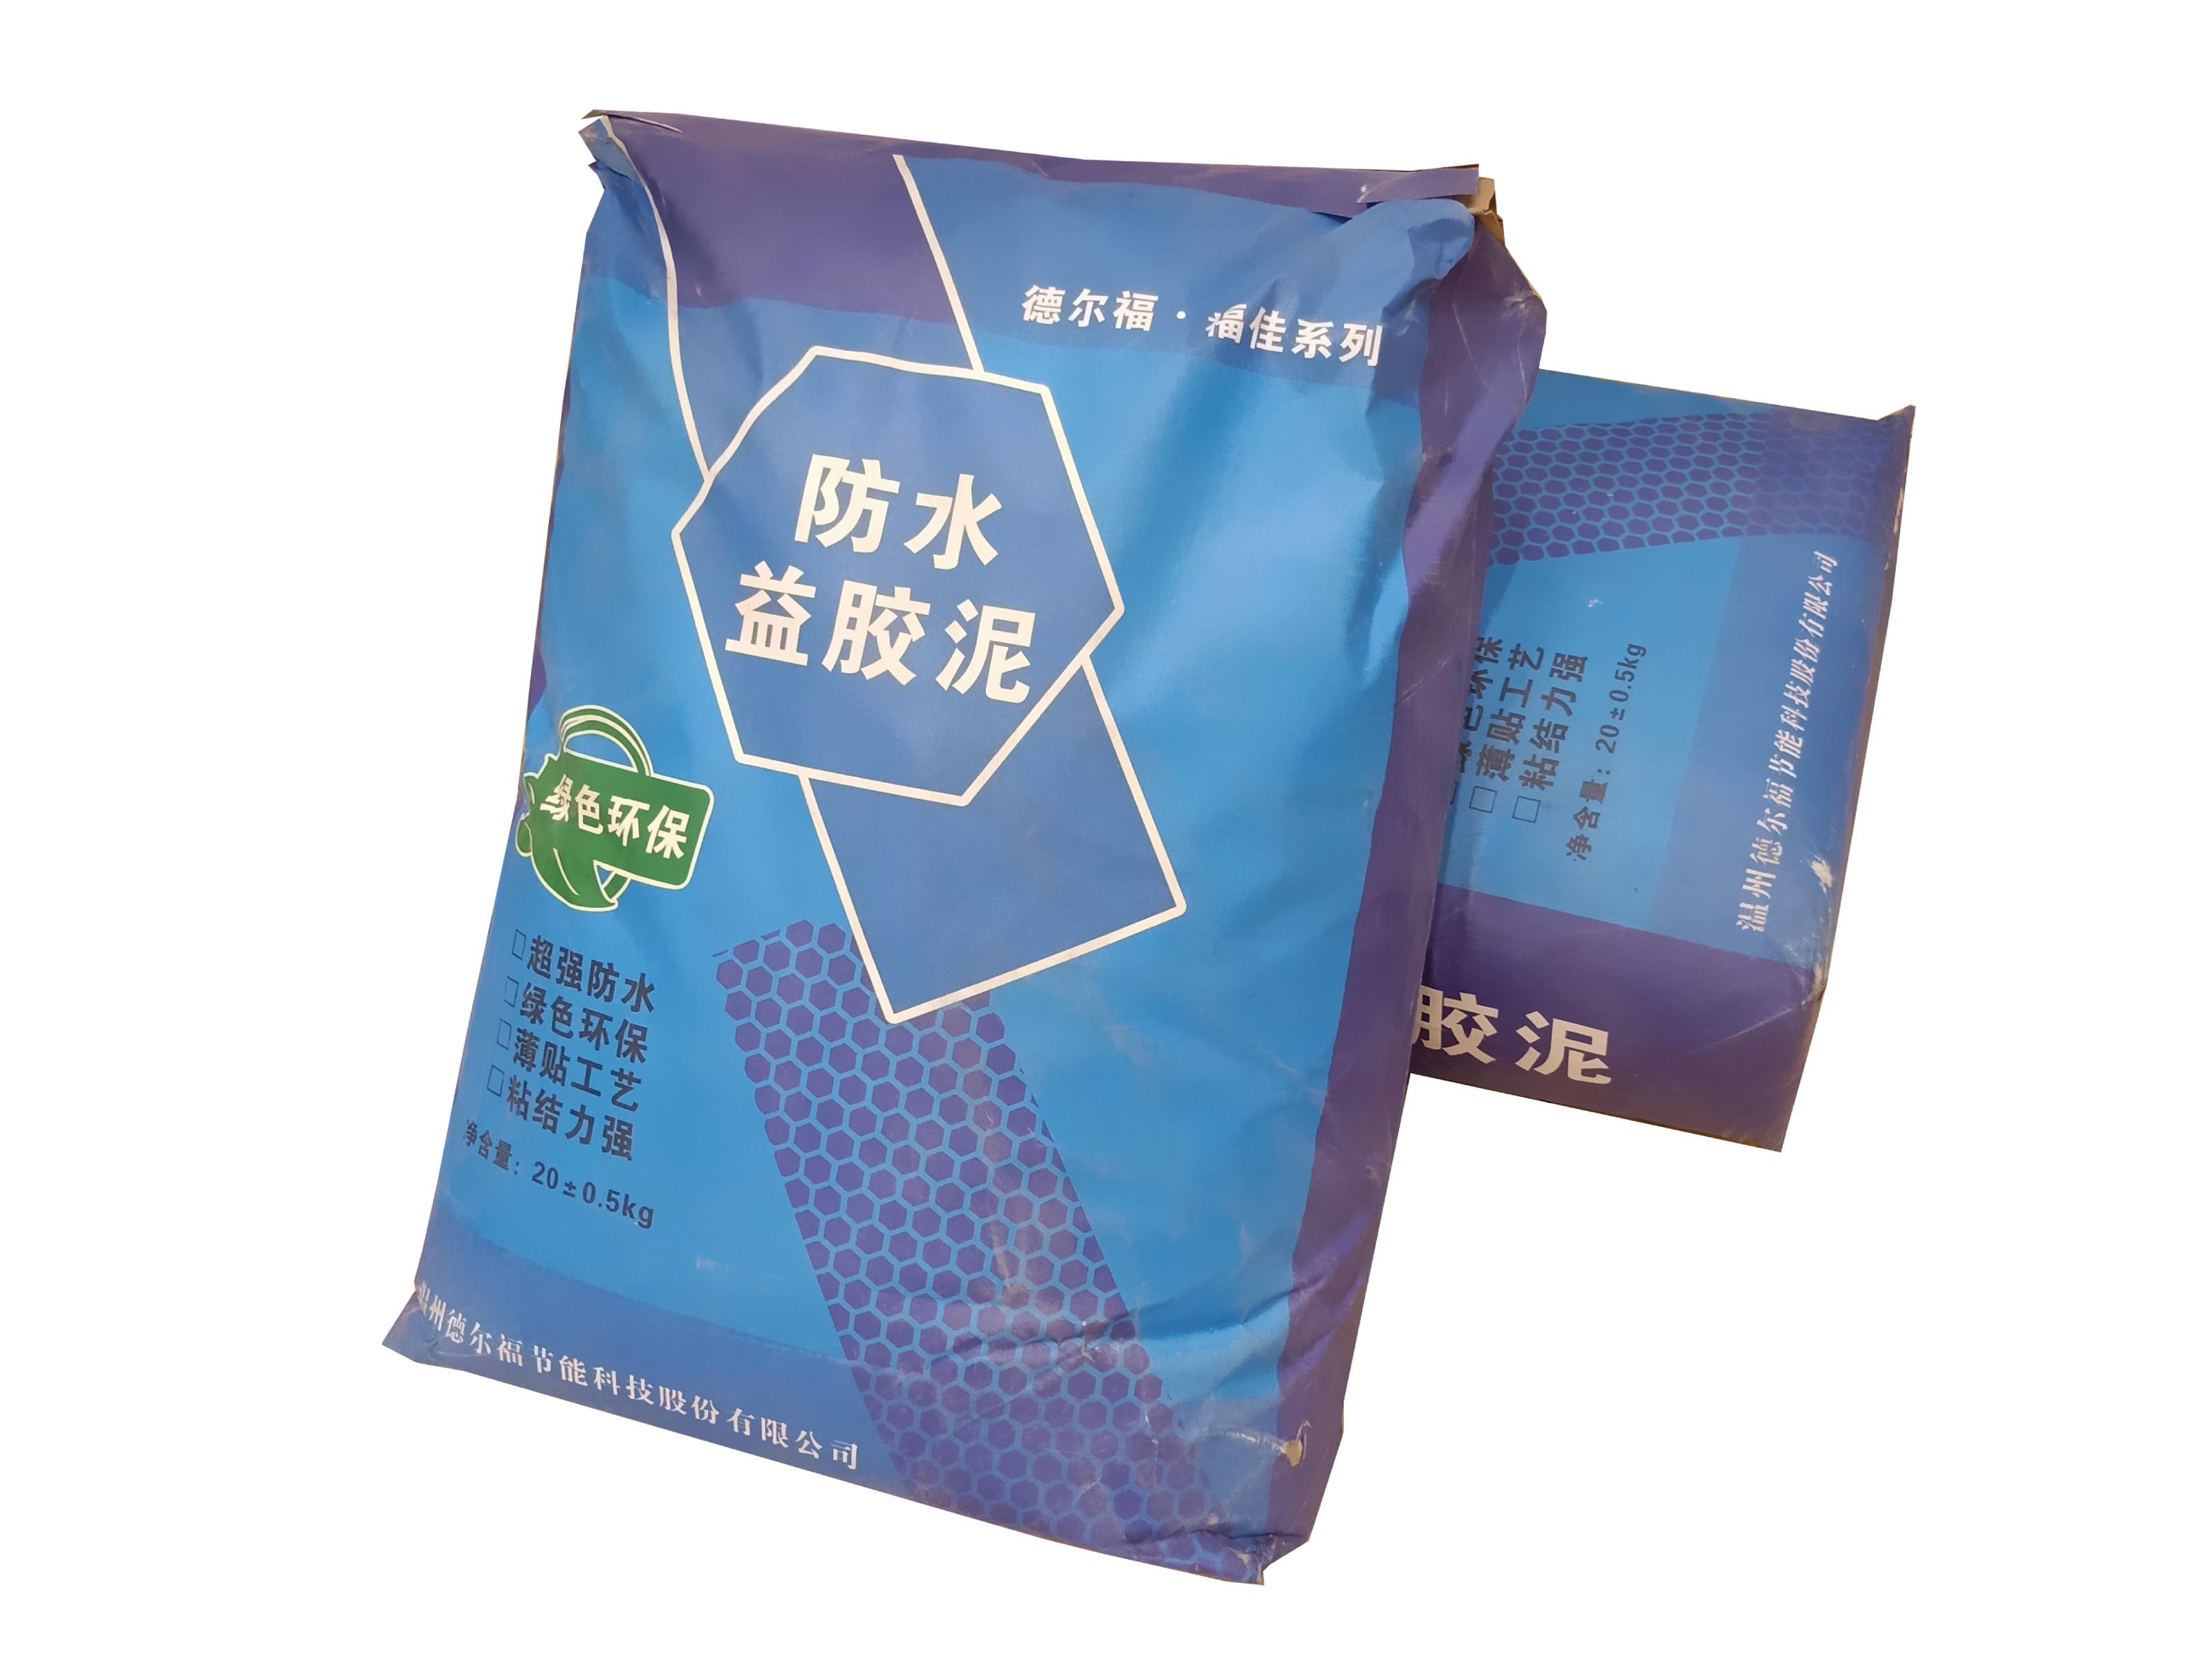 DE-FD5-防水益胶泥